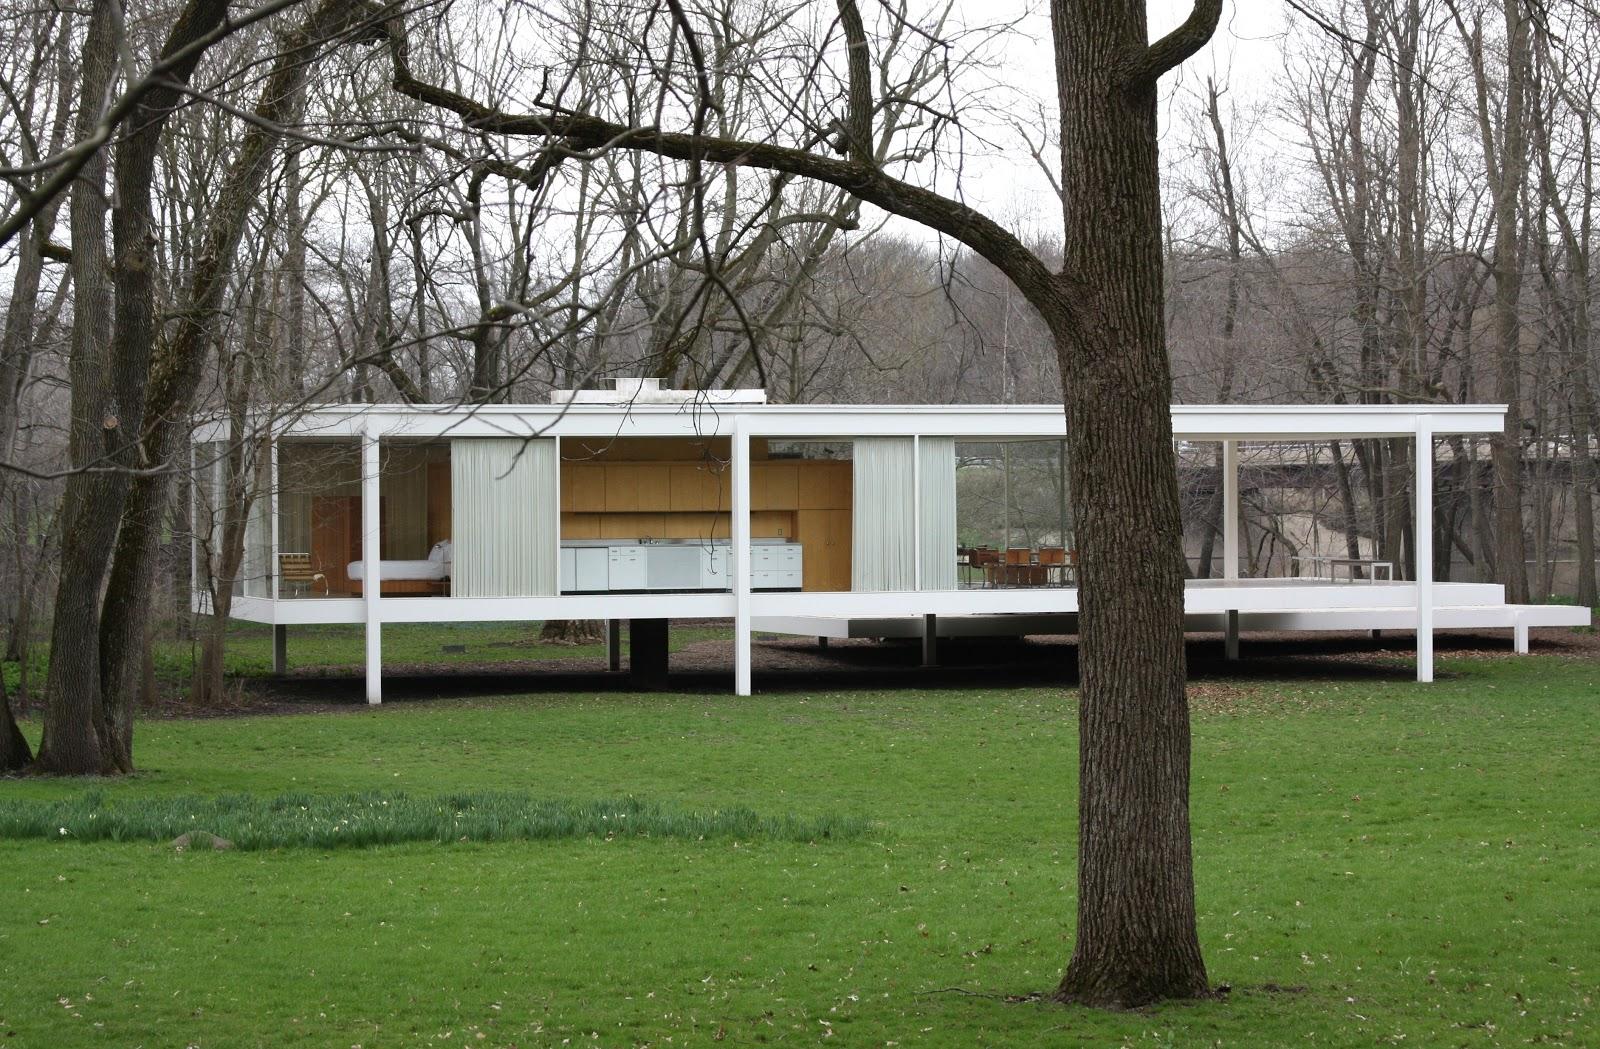 Philip Johnson Glass House artecase | a design blog: philip johnson's glass house 1949